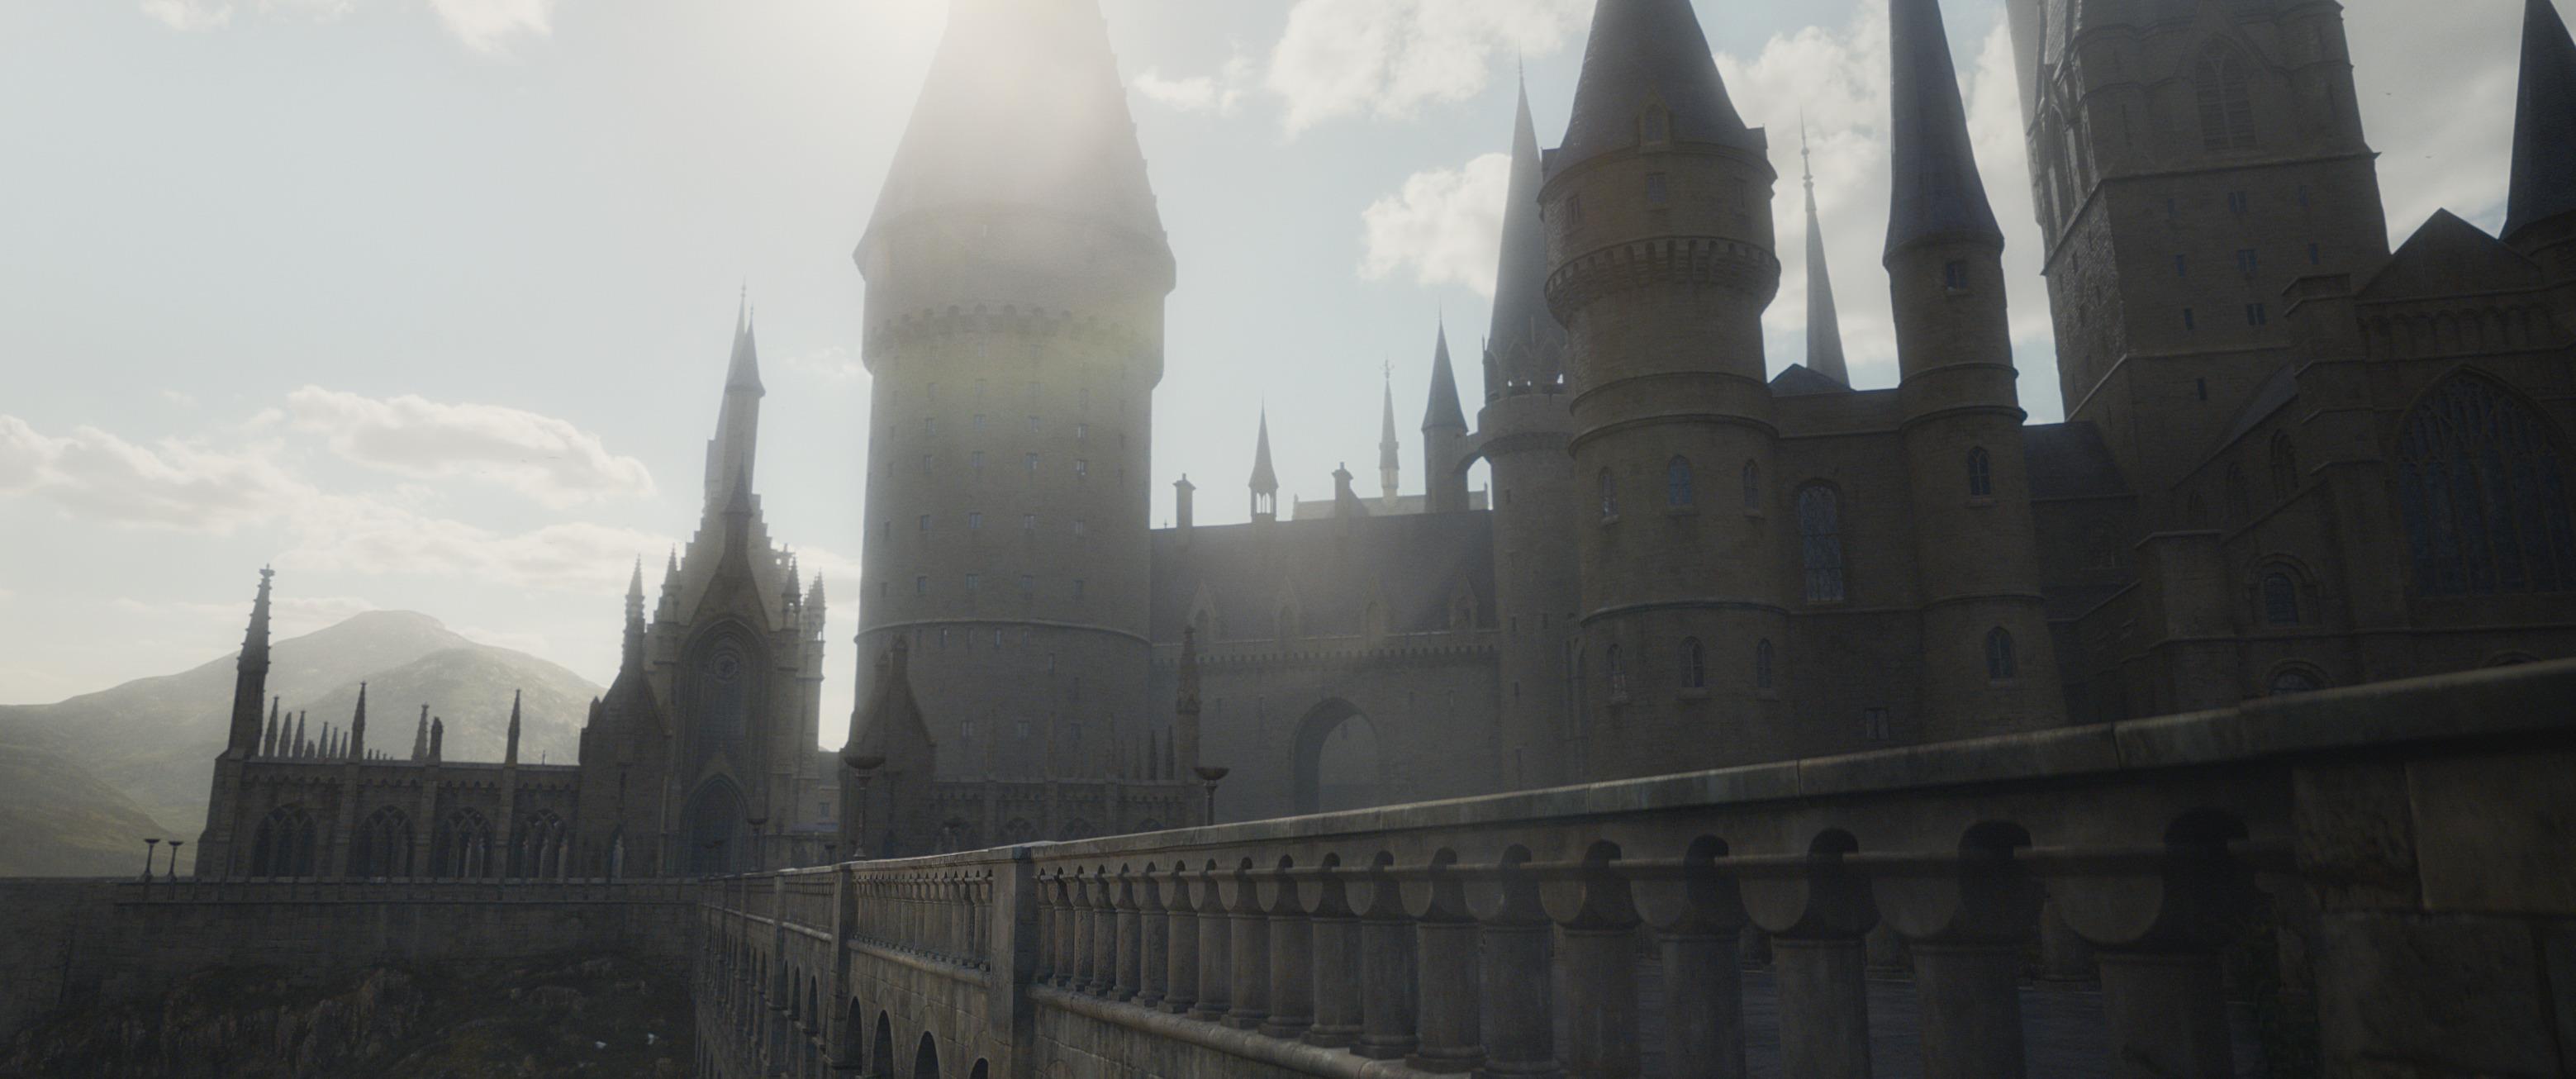 Potterish.com [Year 18] :: Harry Potter, The Ickabog, Fantastic Beasts, JK Rowling, Daniel, Emma & Rupert Back to the Harry Potter universe